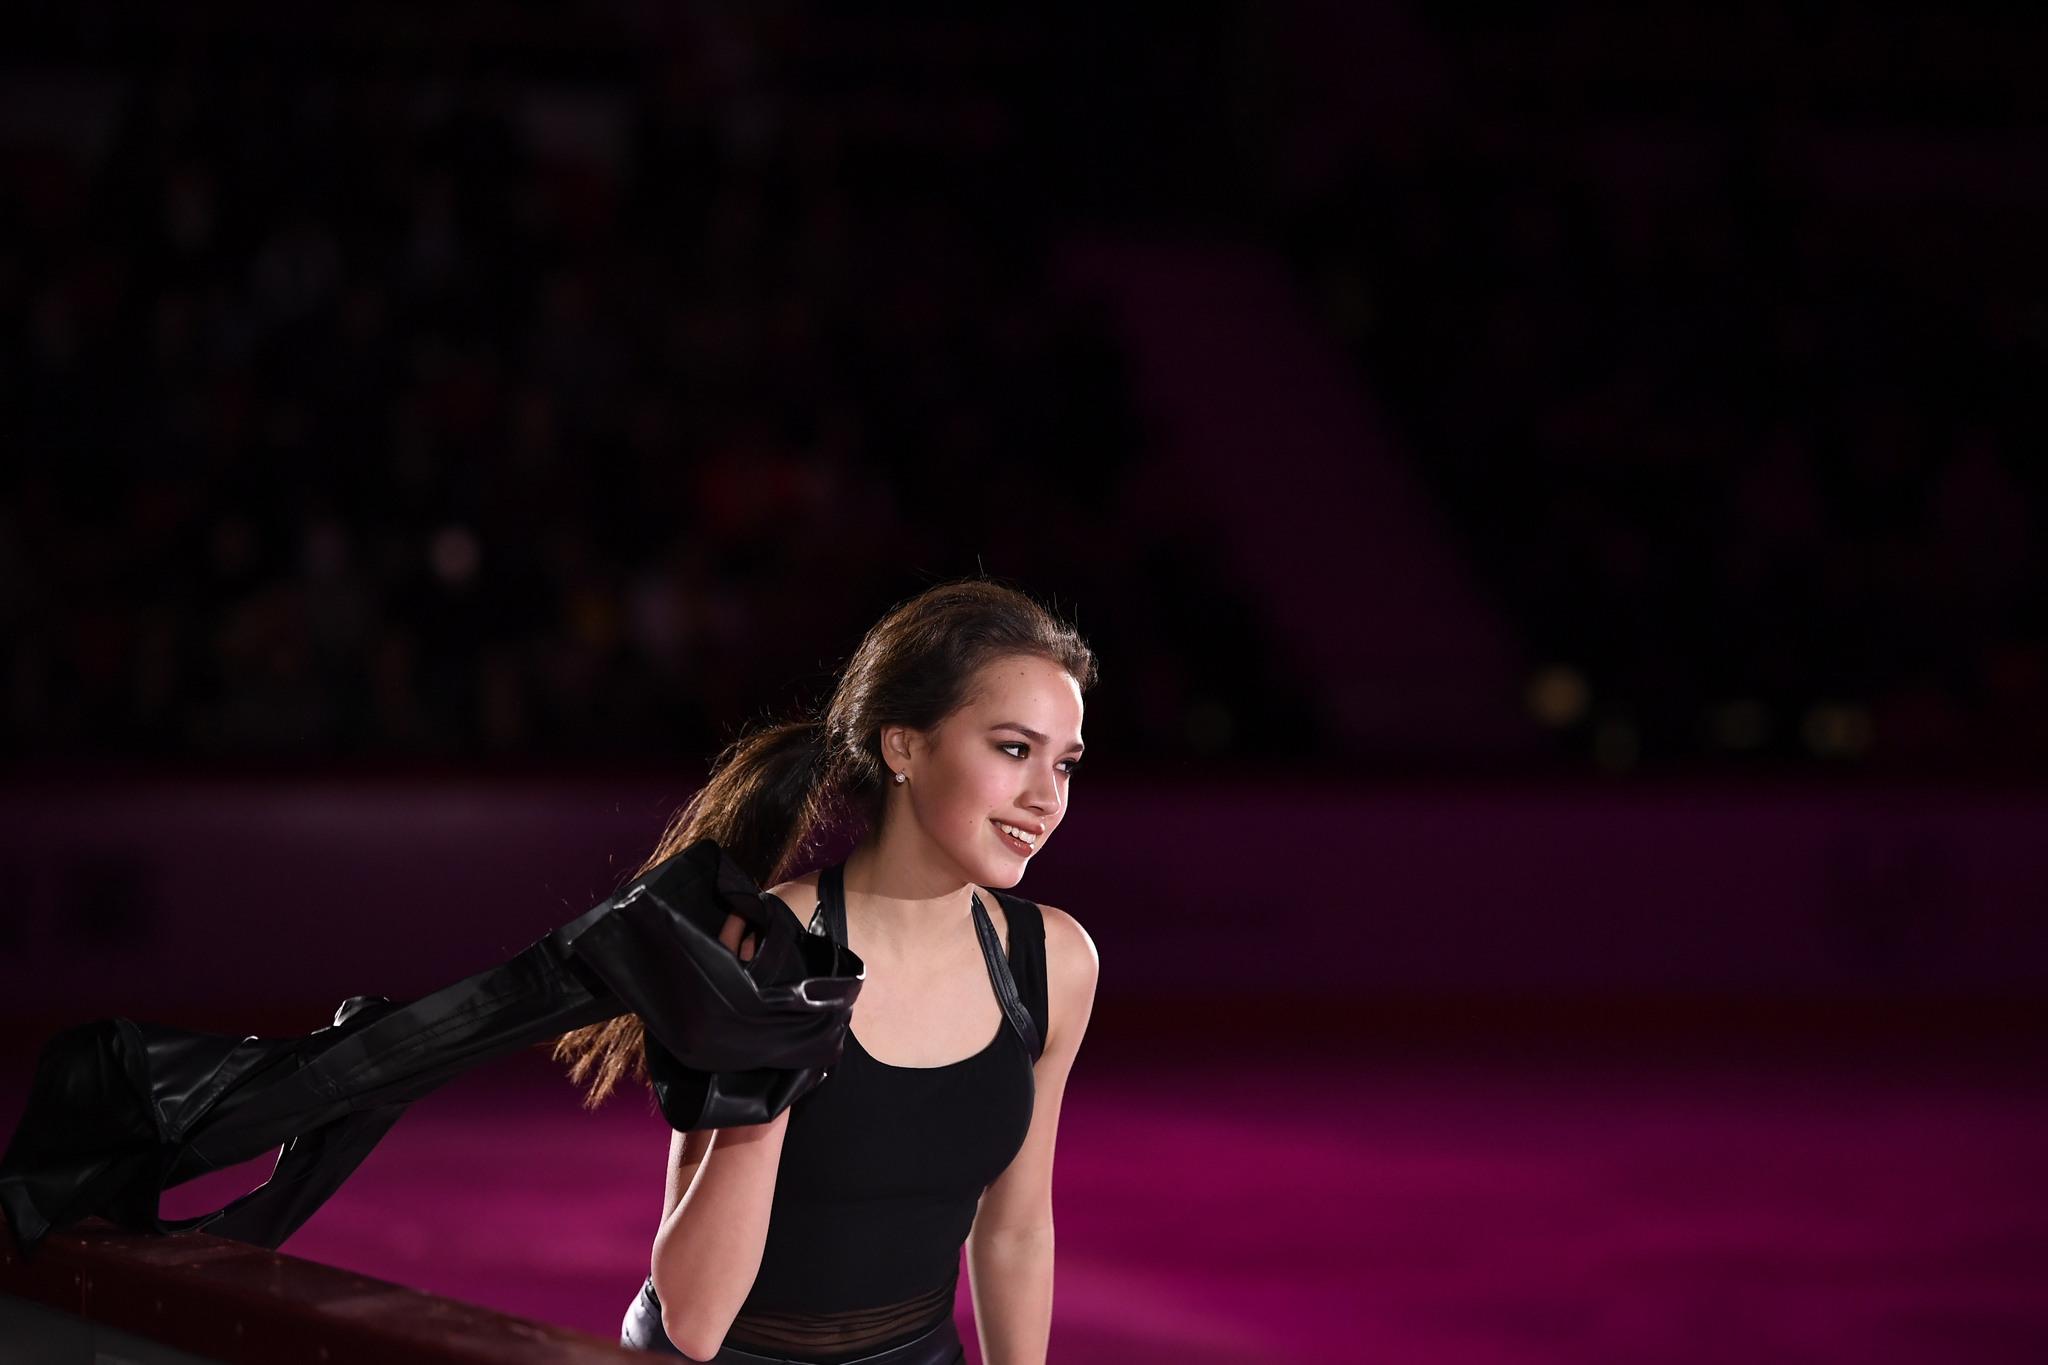 Алина Ильназовна Загитова-2   Олимпийская чемпионка - Страница 3 PpviT